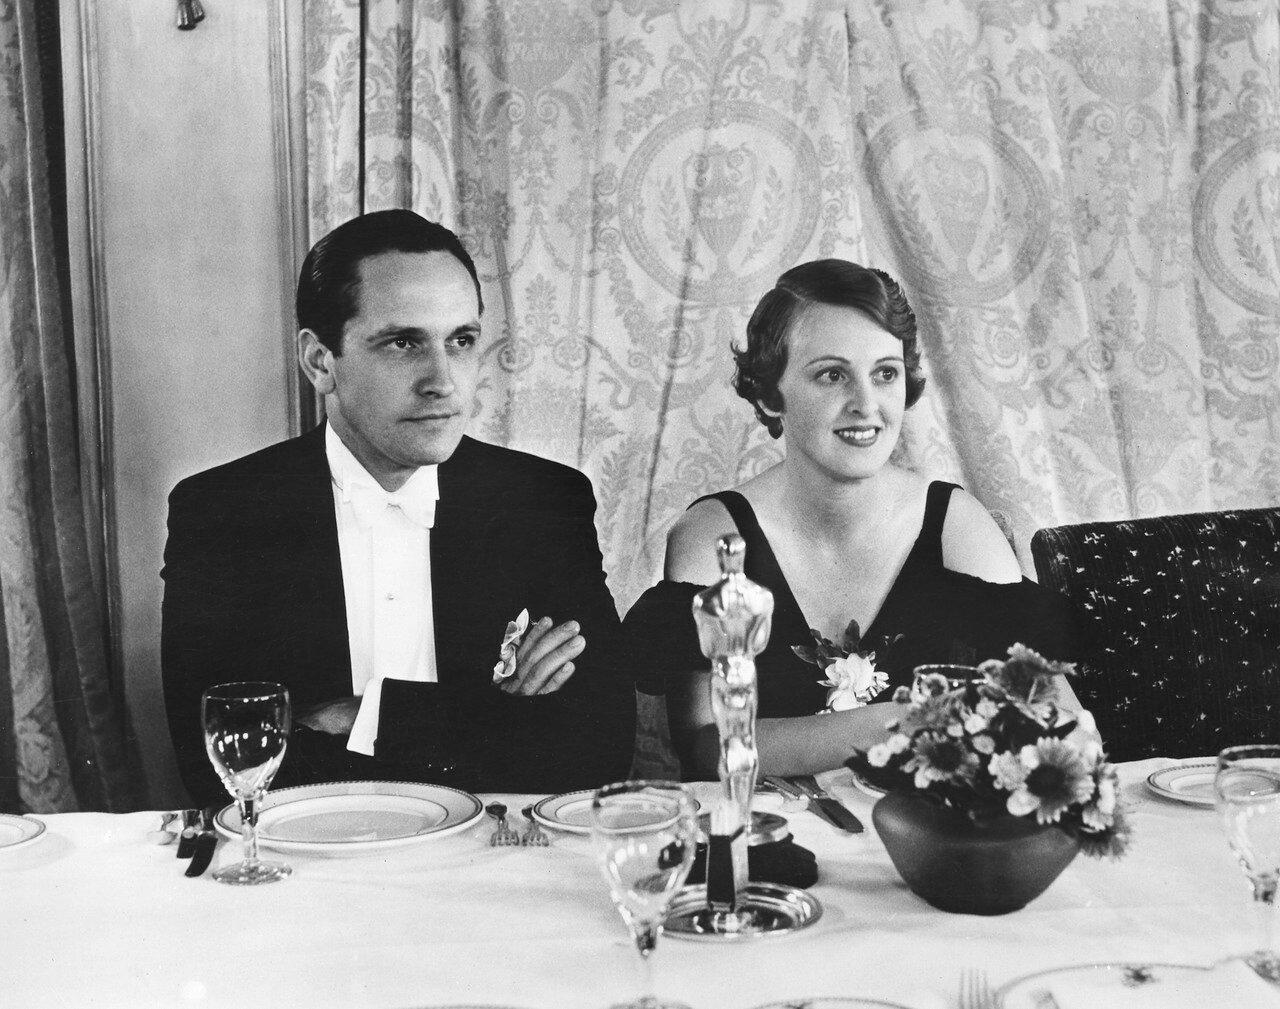 1932. Фредрик Марч — «Доктор Джекилл и мистер Хайд» (Dr. Jekyll and Mr. Hyde) со своей женой Флоренс Элдридж